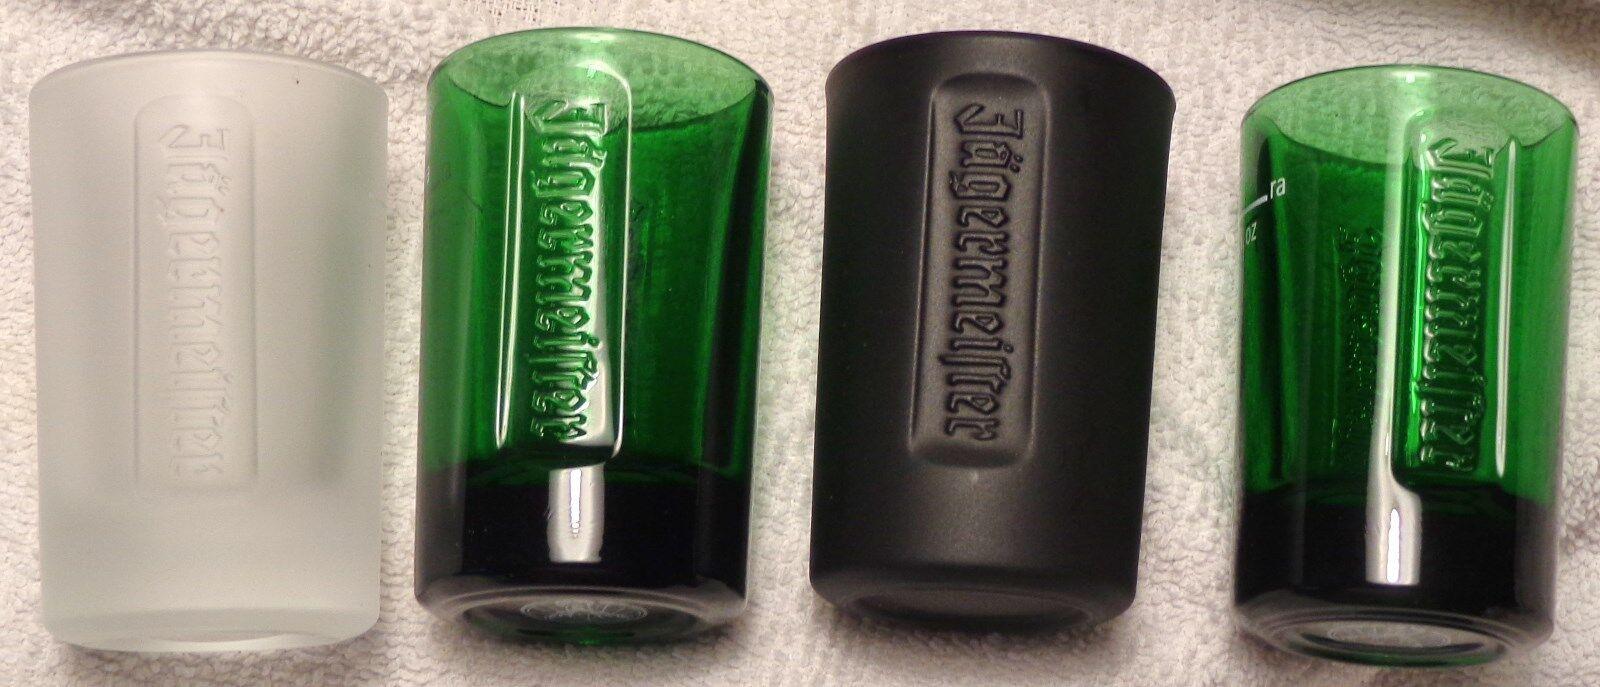 JAGERMEISTER Set Of 6 JAGER GREEN GLASS SHOT GLASSES W// EMBOSSED LOGO NEW!